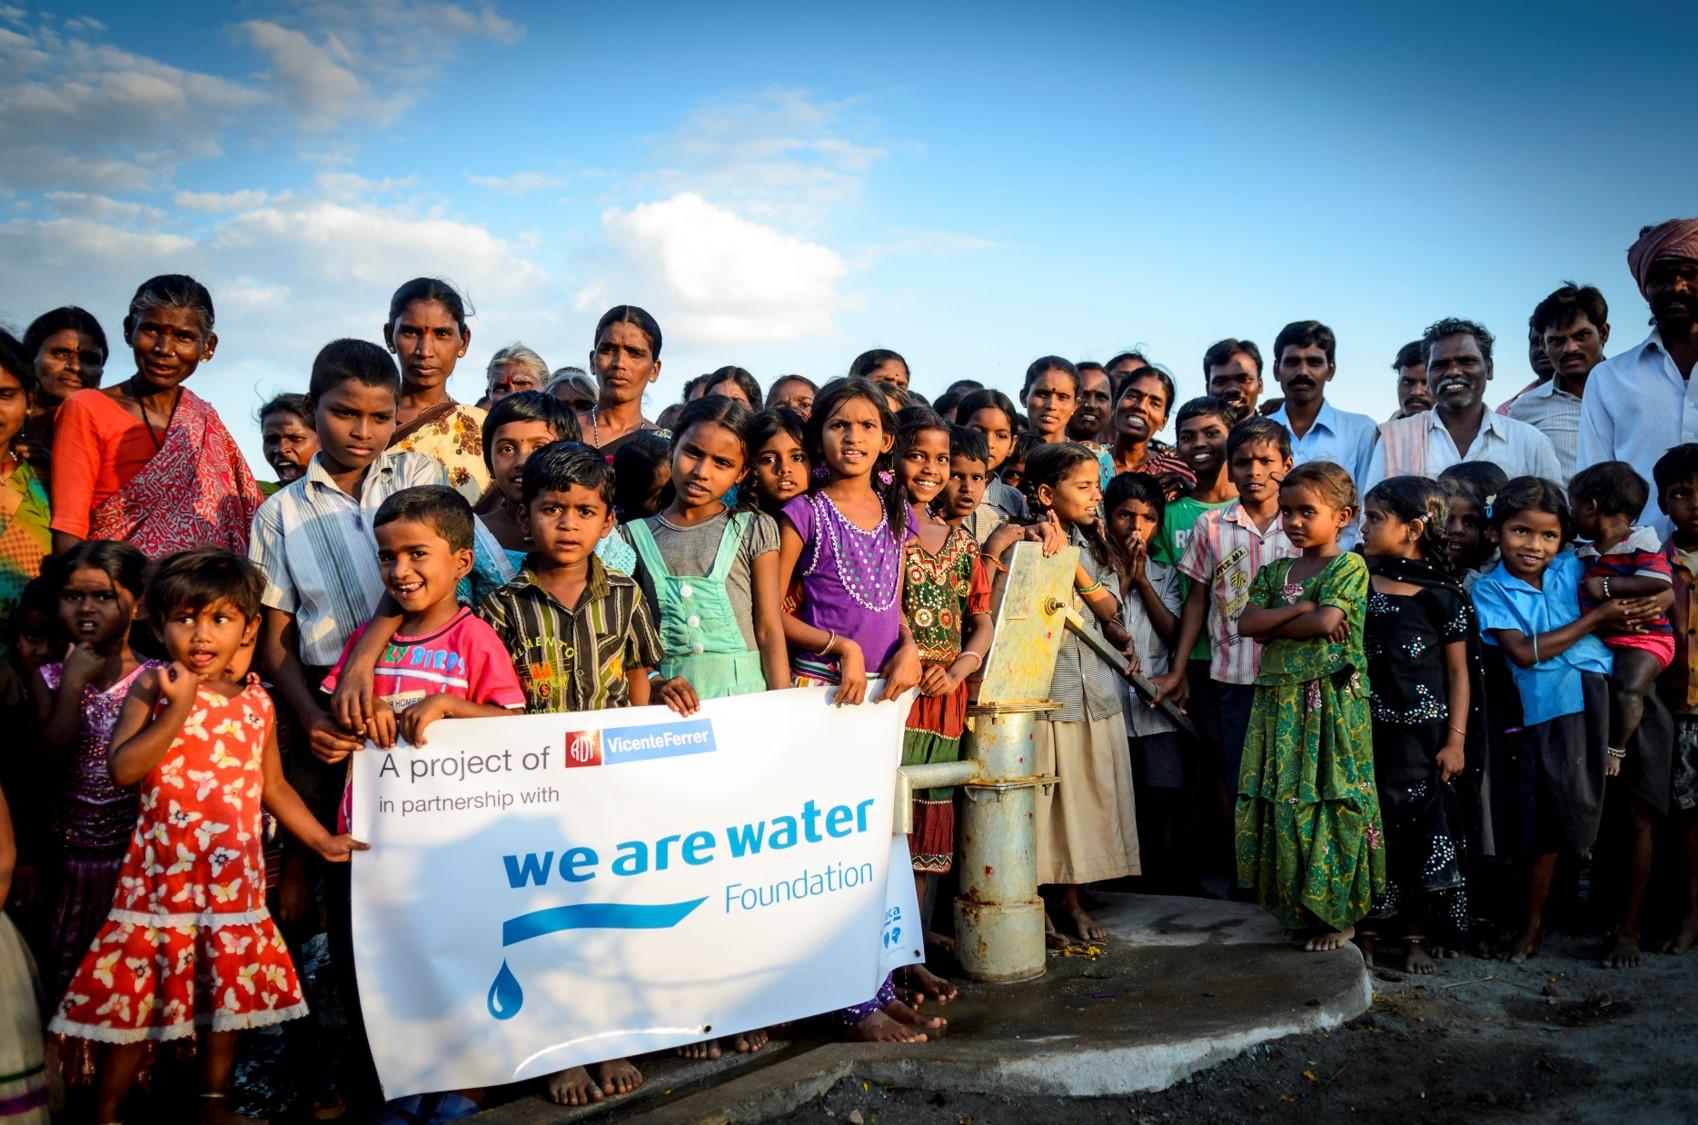 La fundaci n we are water inaugura su 1 oficina en la for We are water